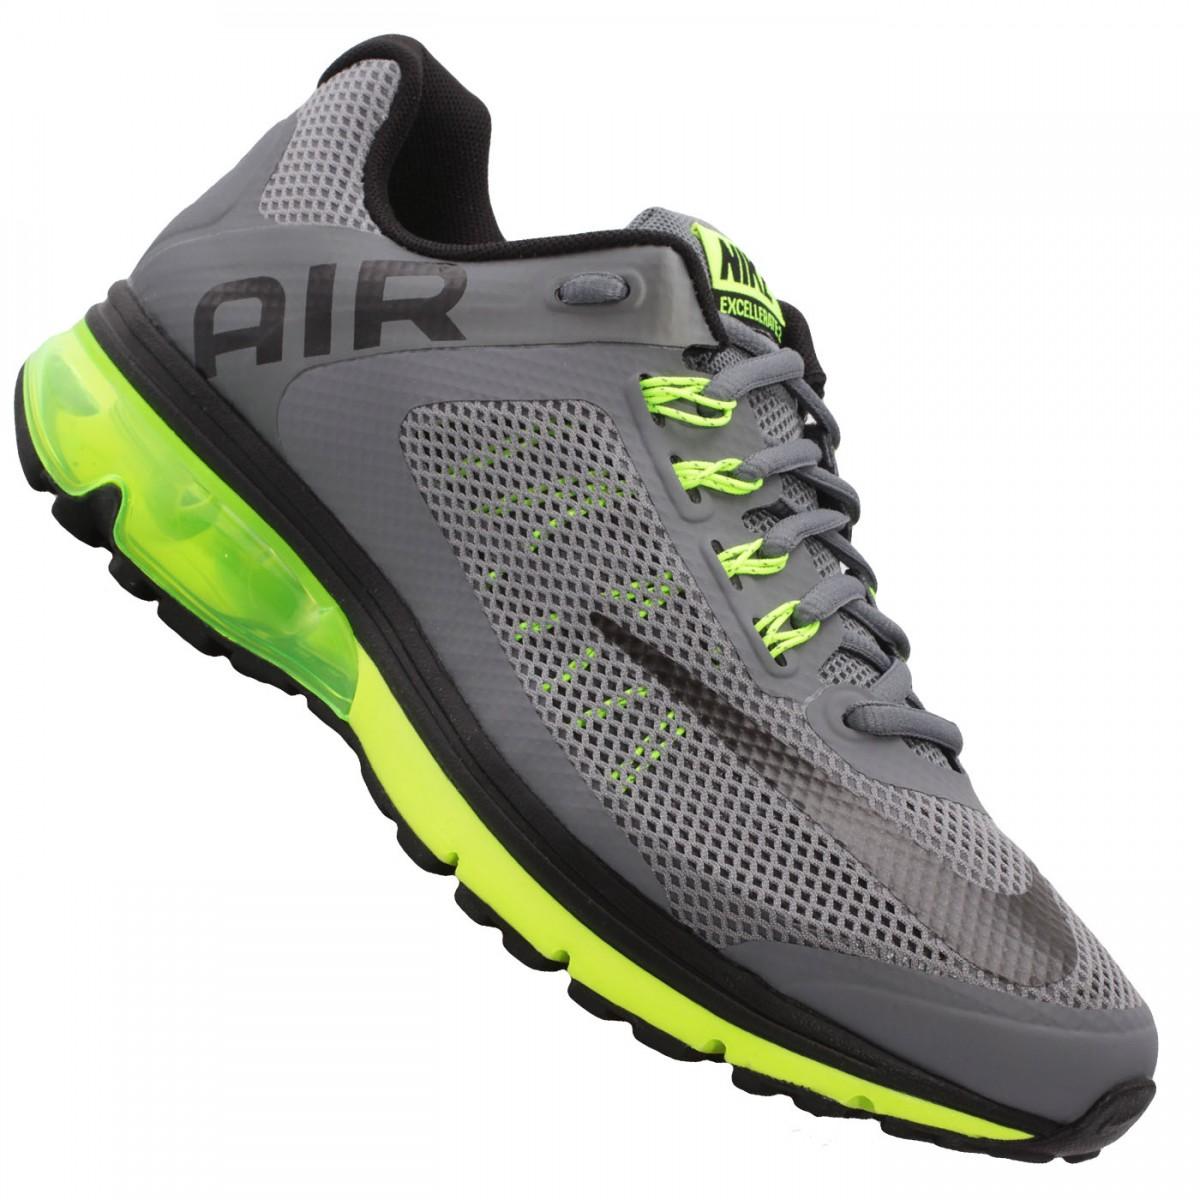 new product 2df5e 9f7f9 Tênis Nike Air Max Excellerate+ 2   Treino e Corrida